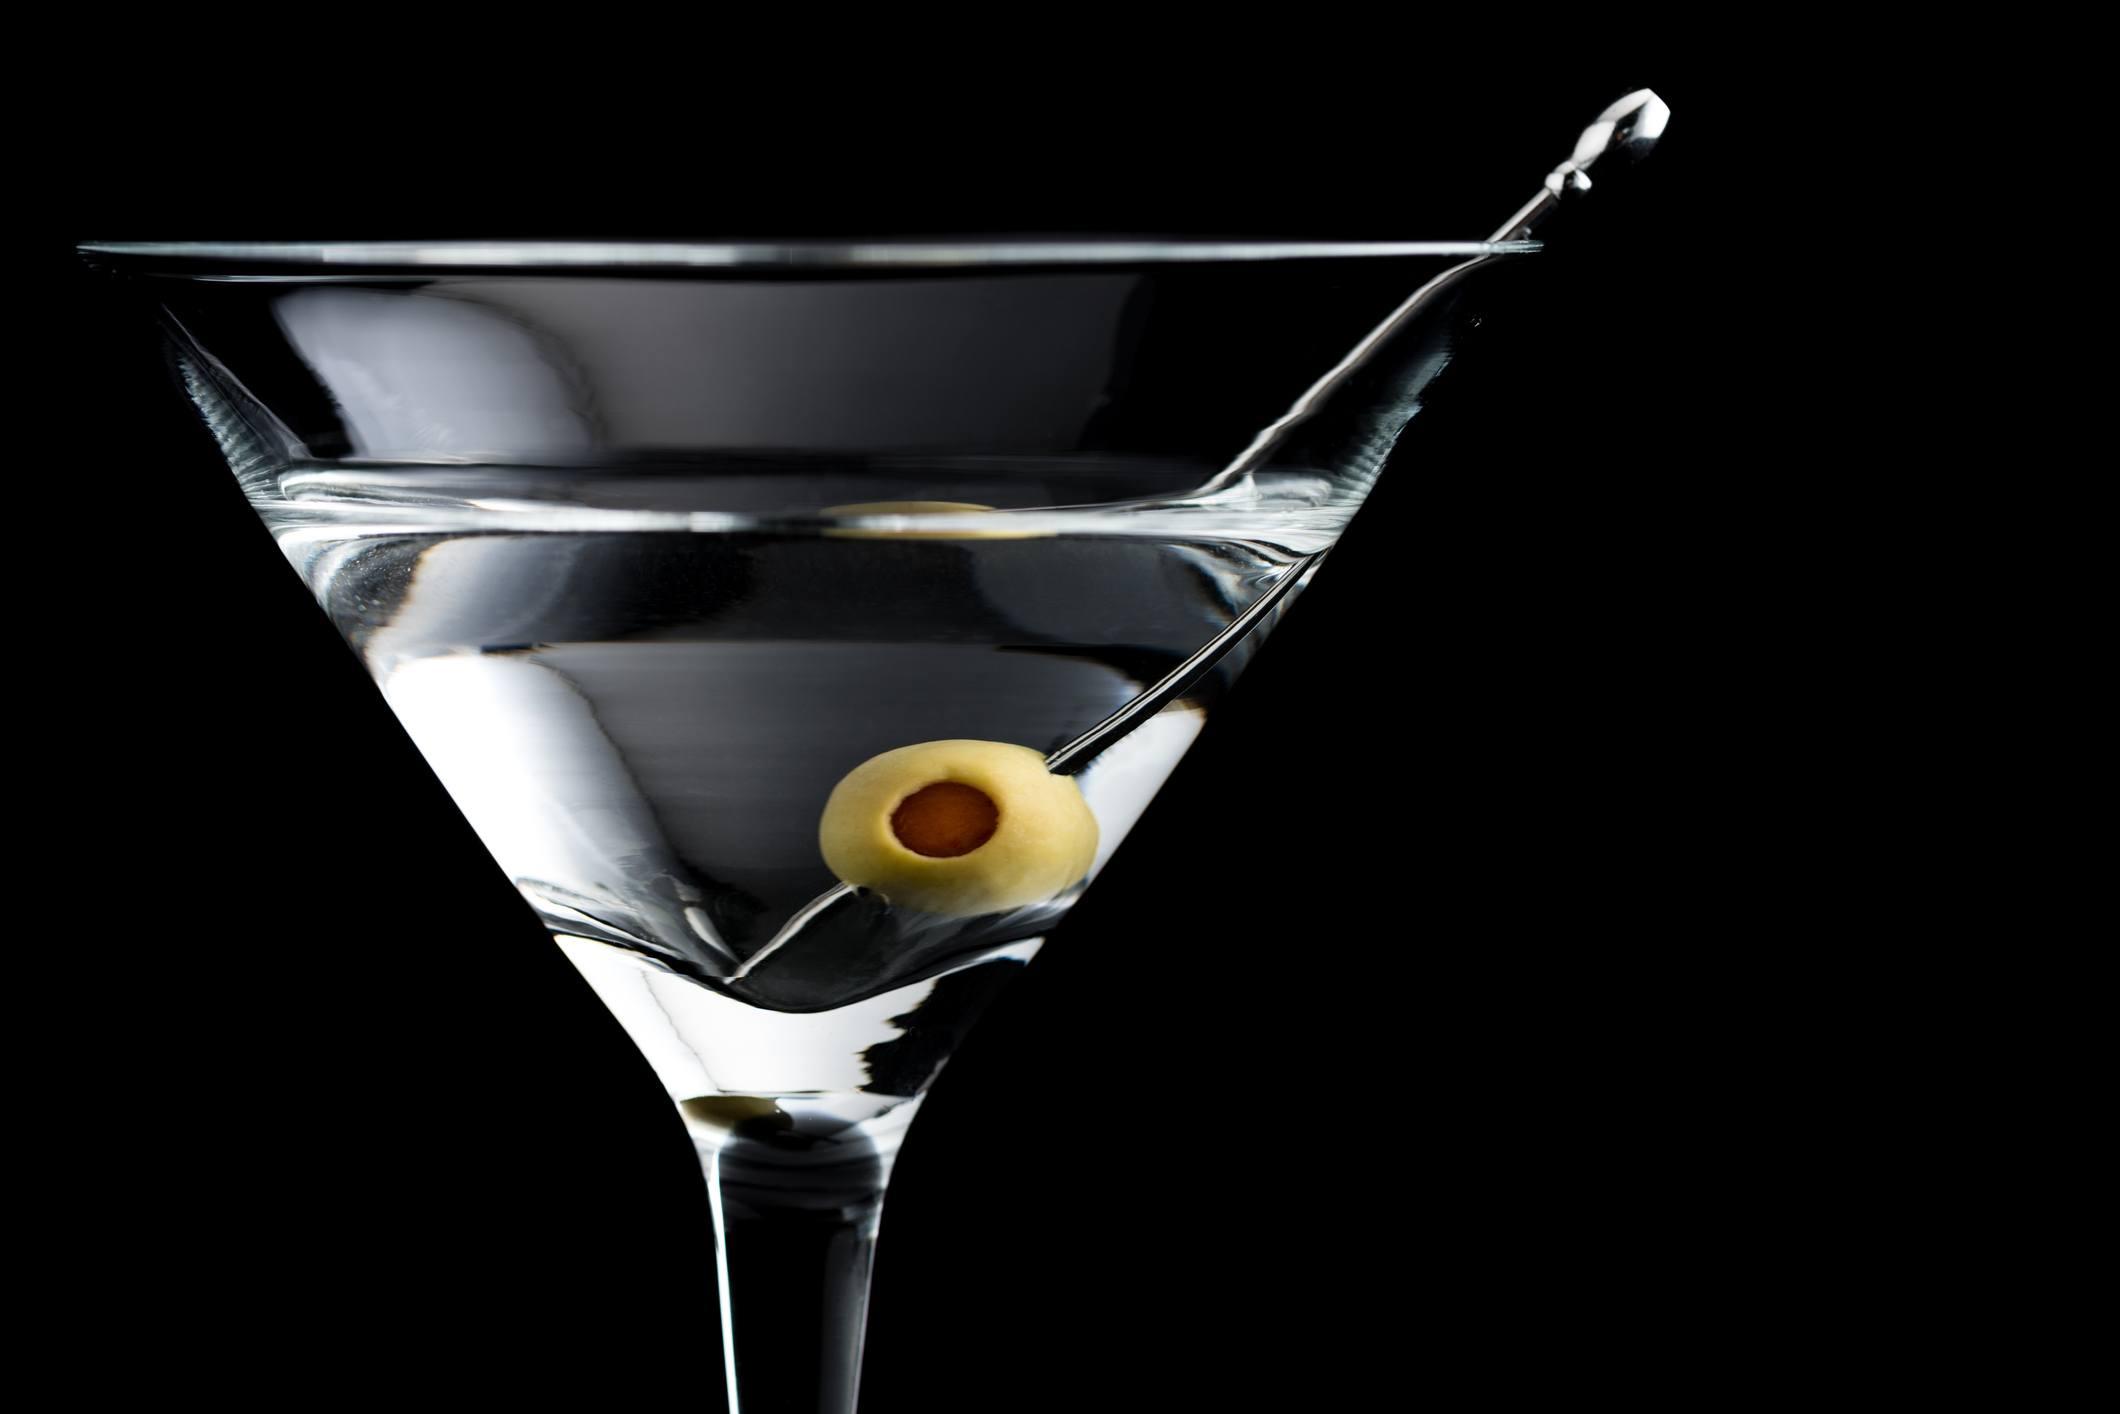 Vodka martin cocktail with olives on black background